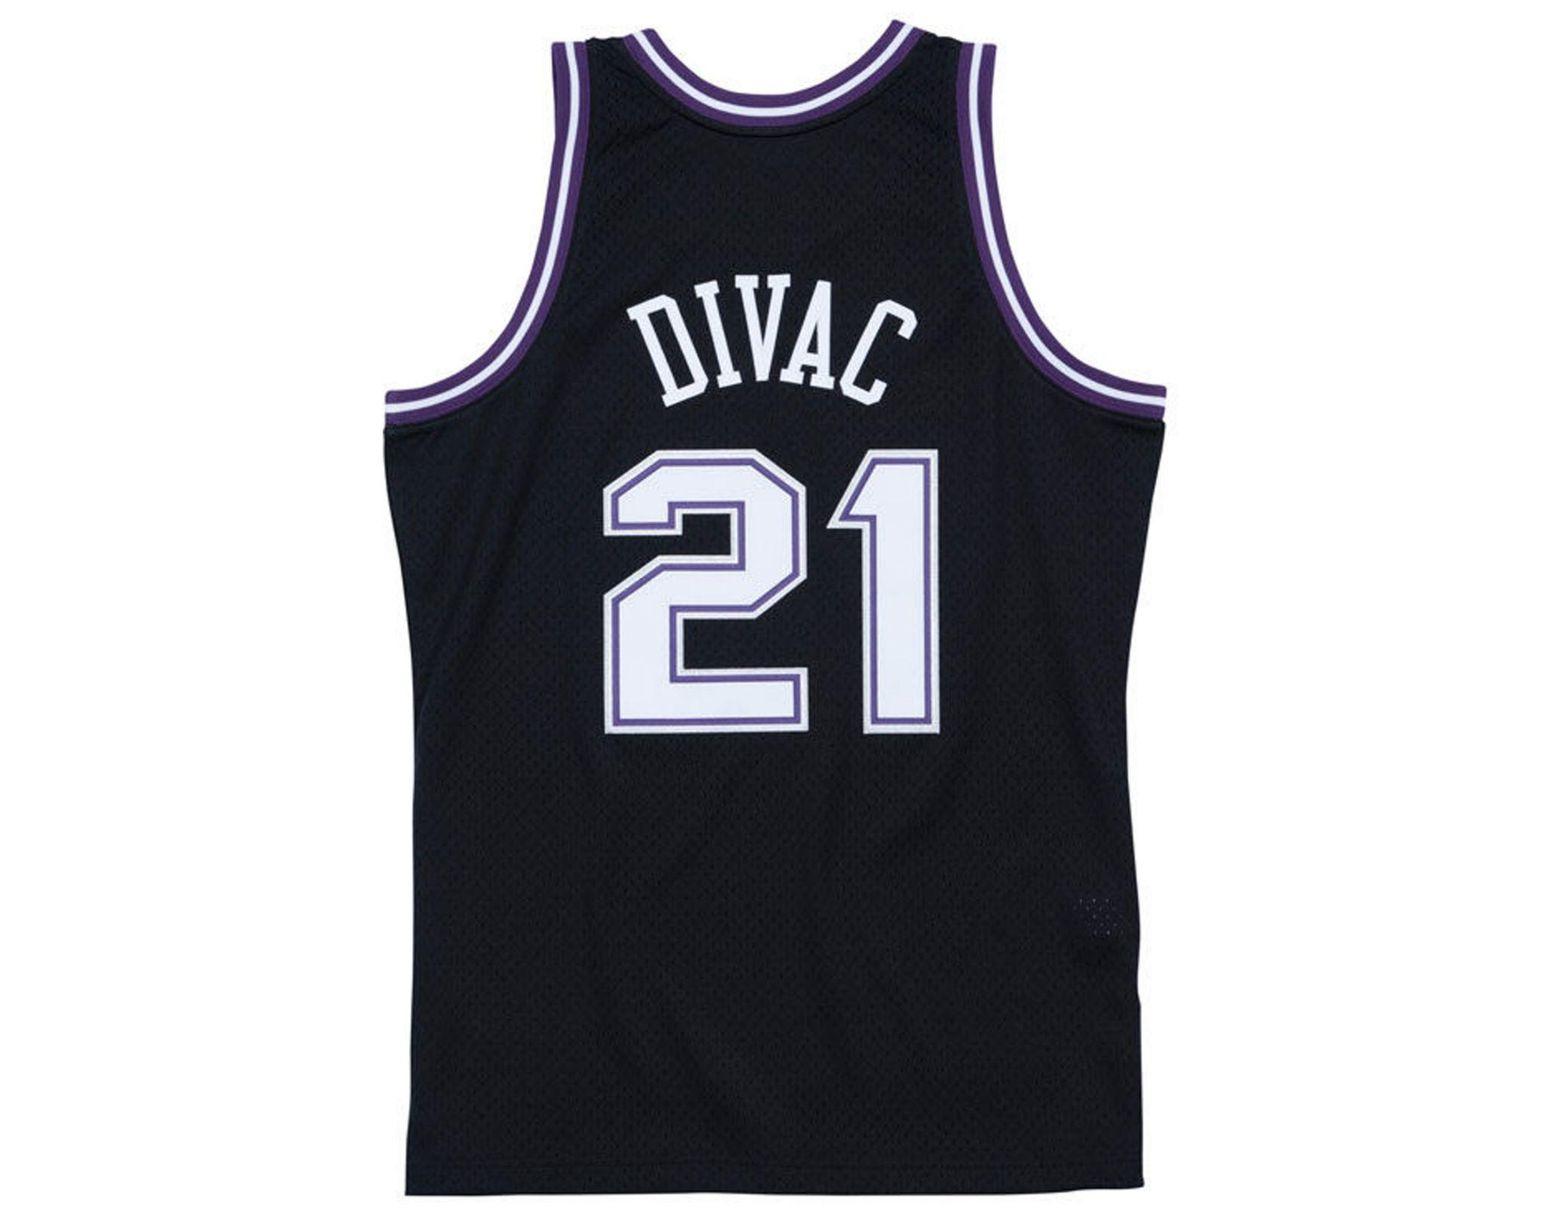 1e2620fc2 Mitchell   Ness. Black Vlade Divac Sacramento Kings Hardwood Classic  Swingman Jersey